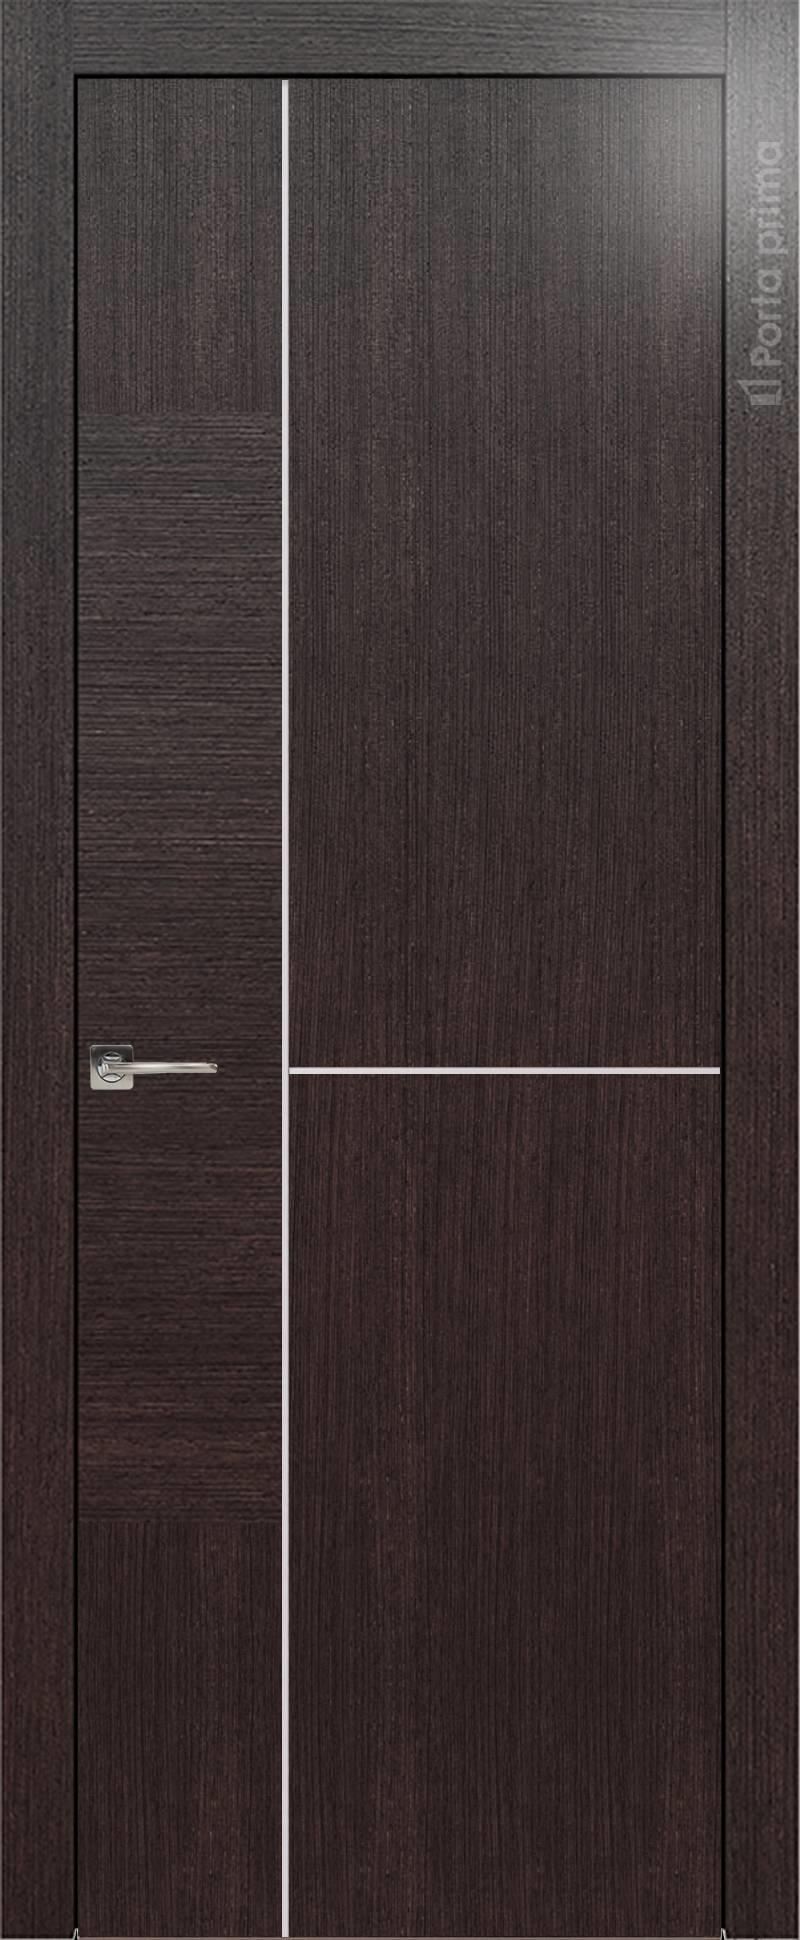 Tivoli Г-1 цвет - Венге Шоколад Без стекла (ДГ)